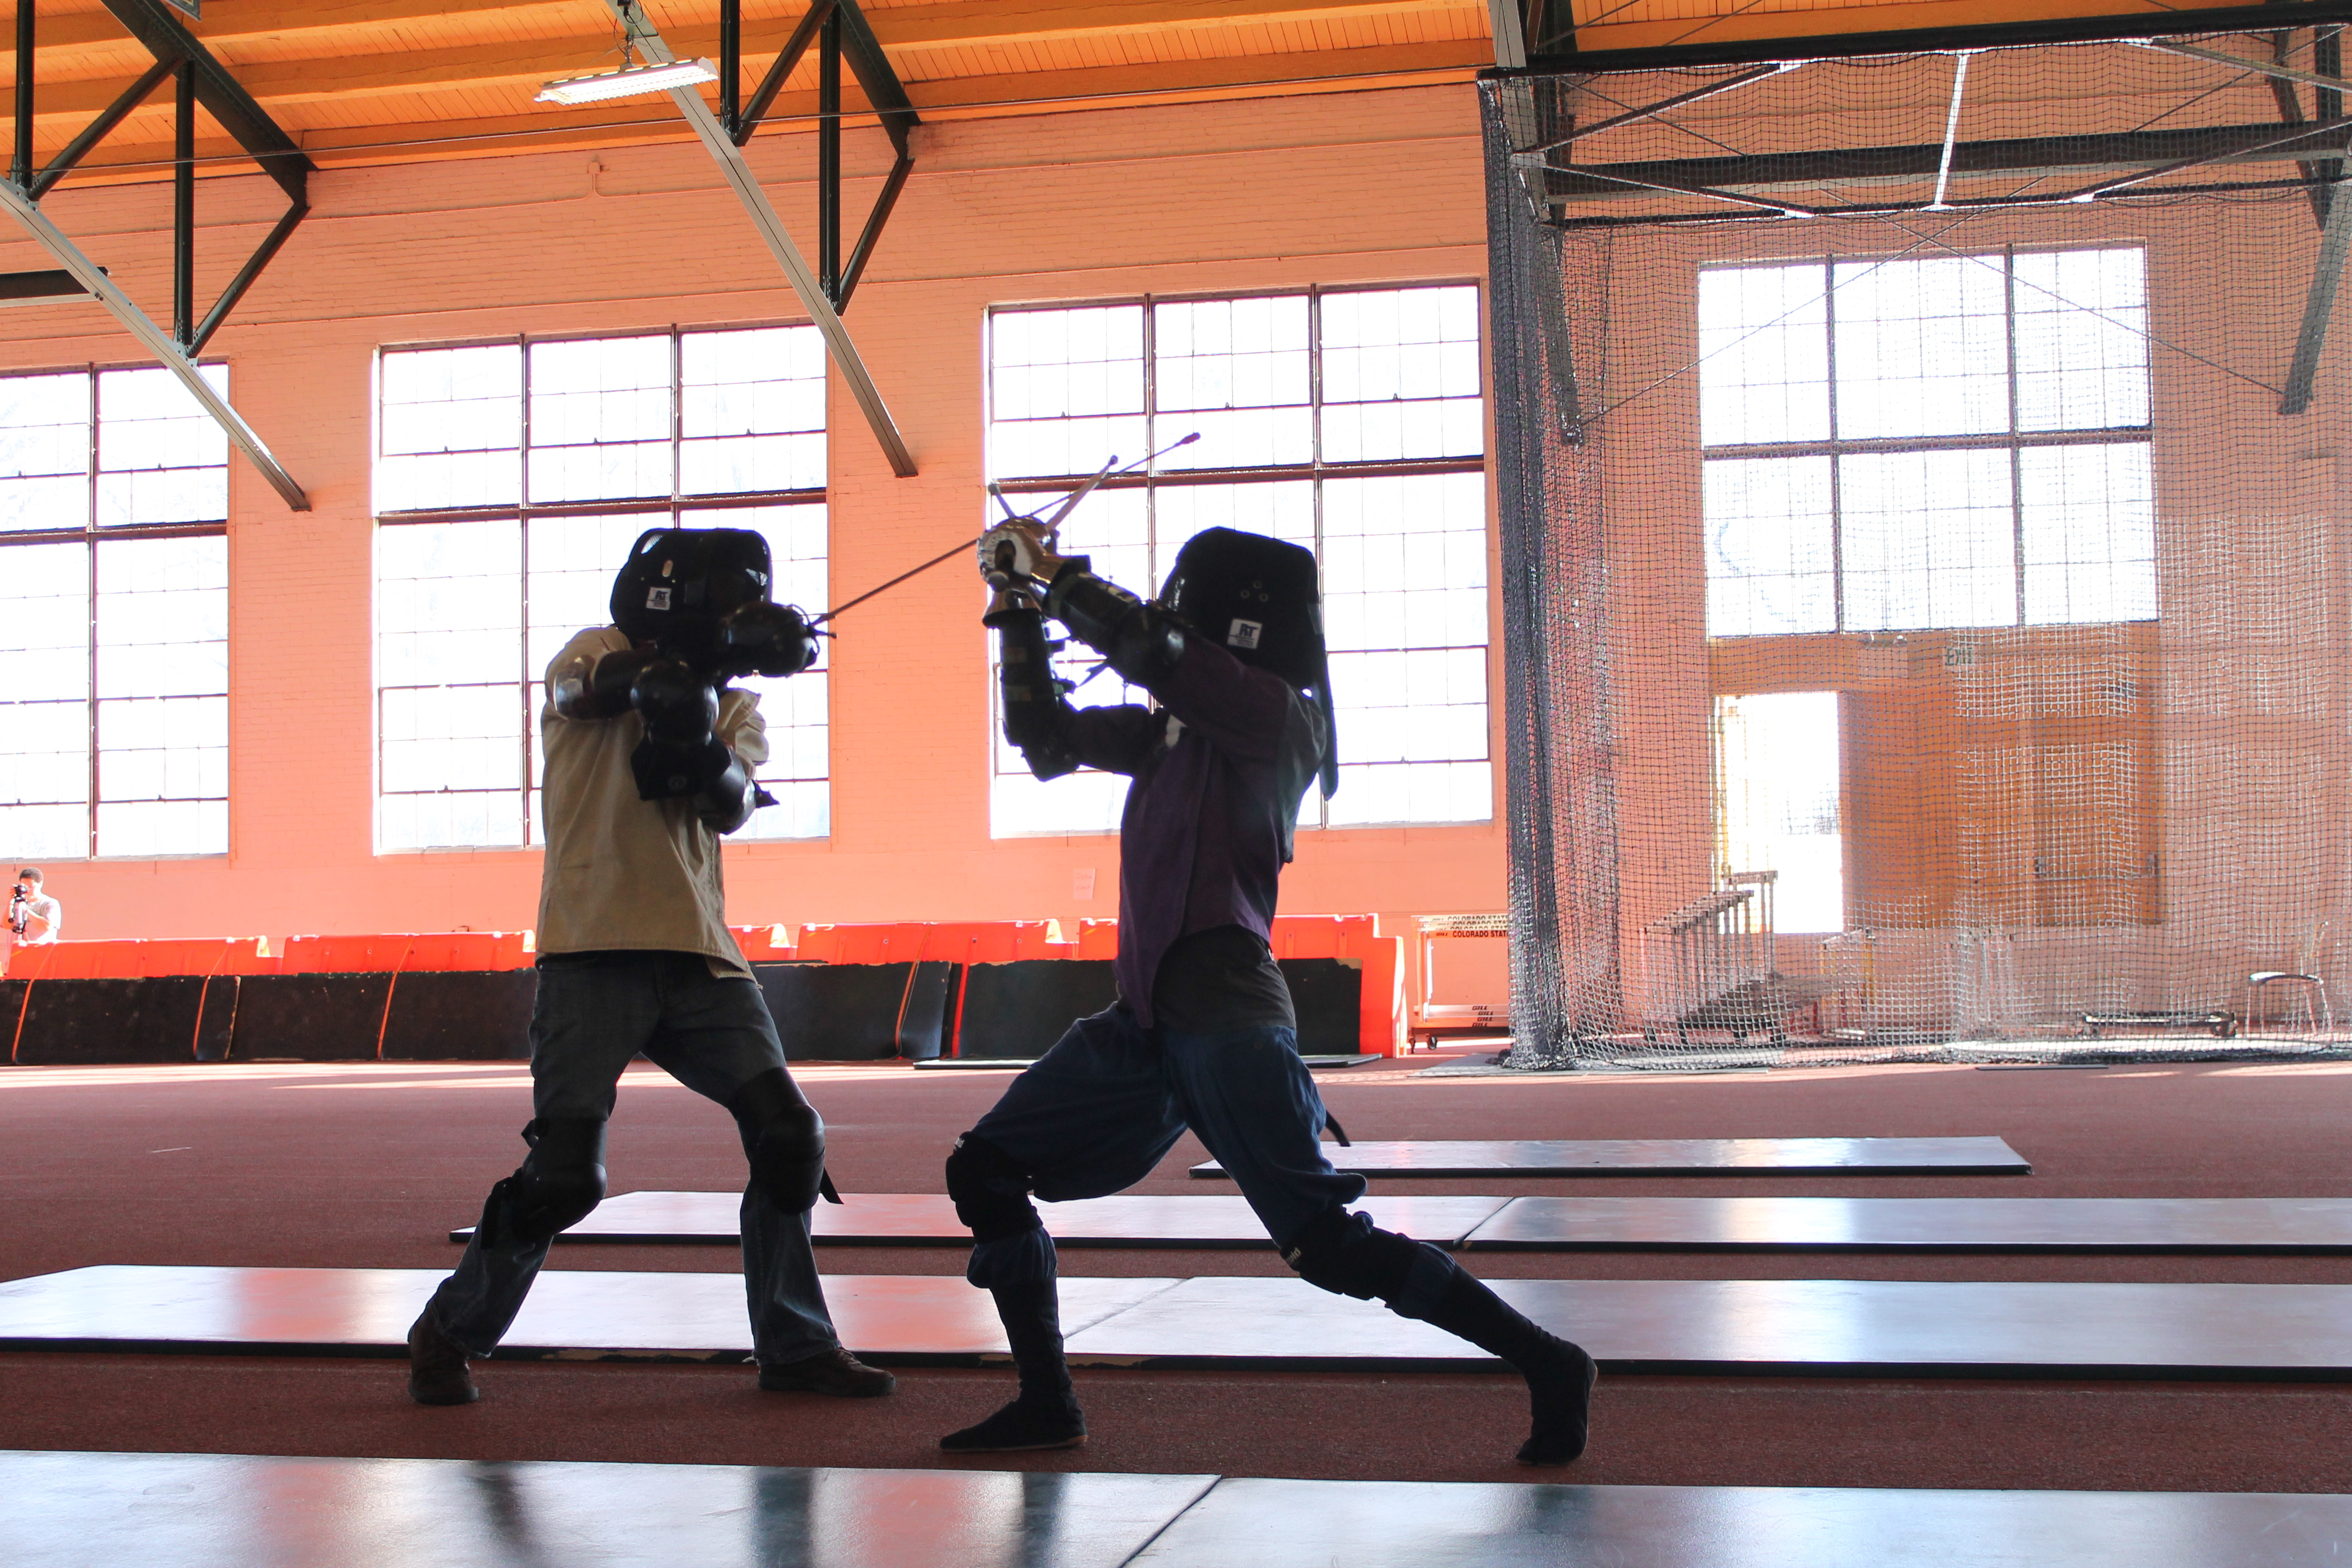 022518_jprice_AC_Medieval Sword Fighting_9 - The Rocky